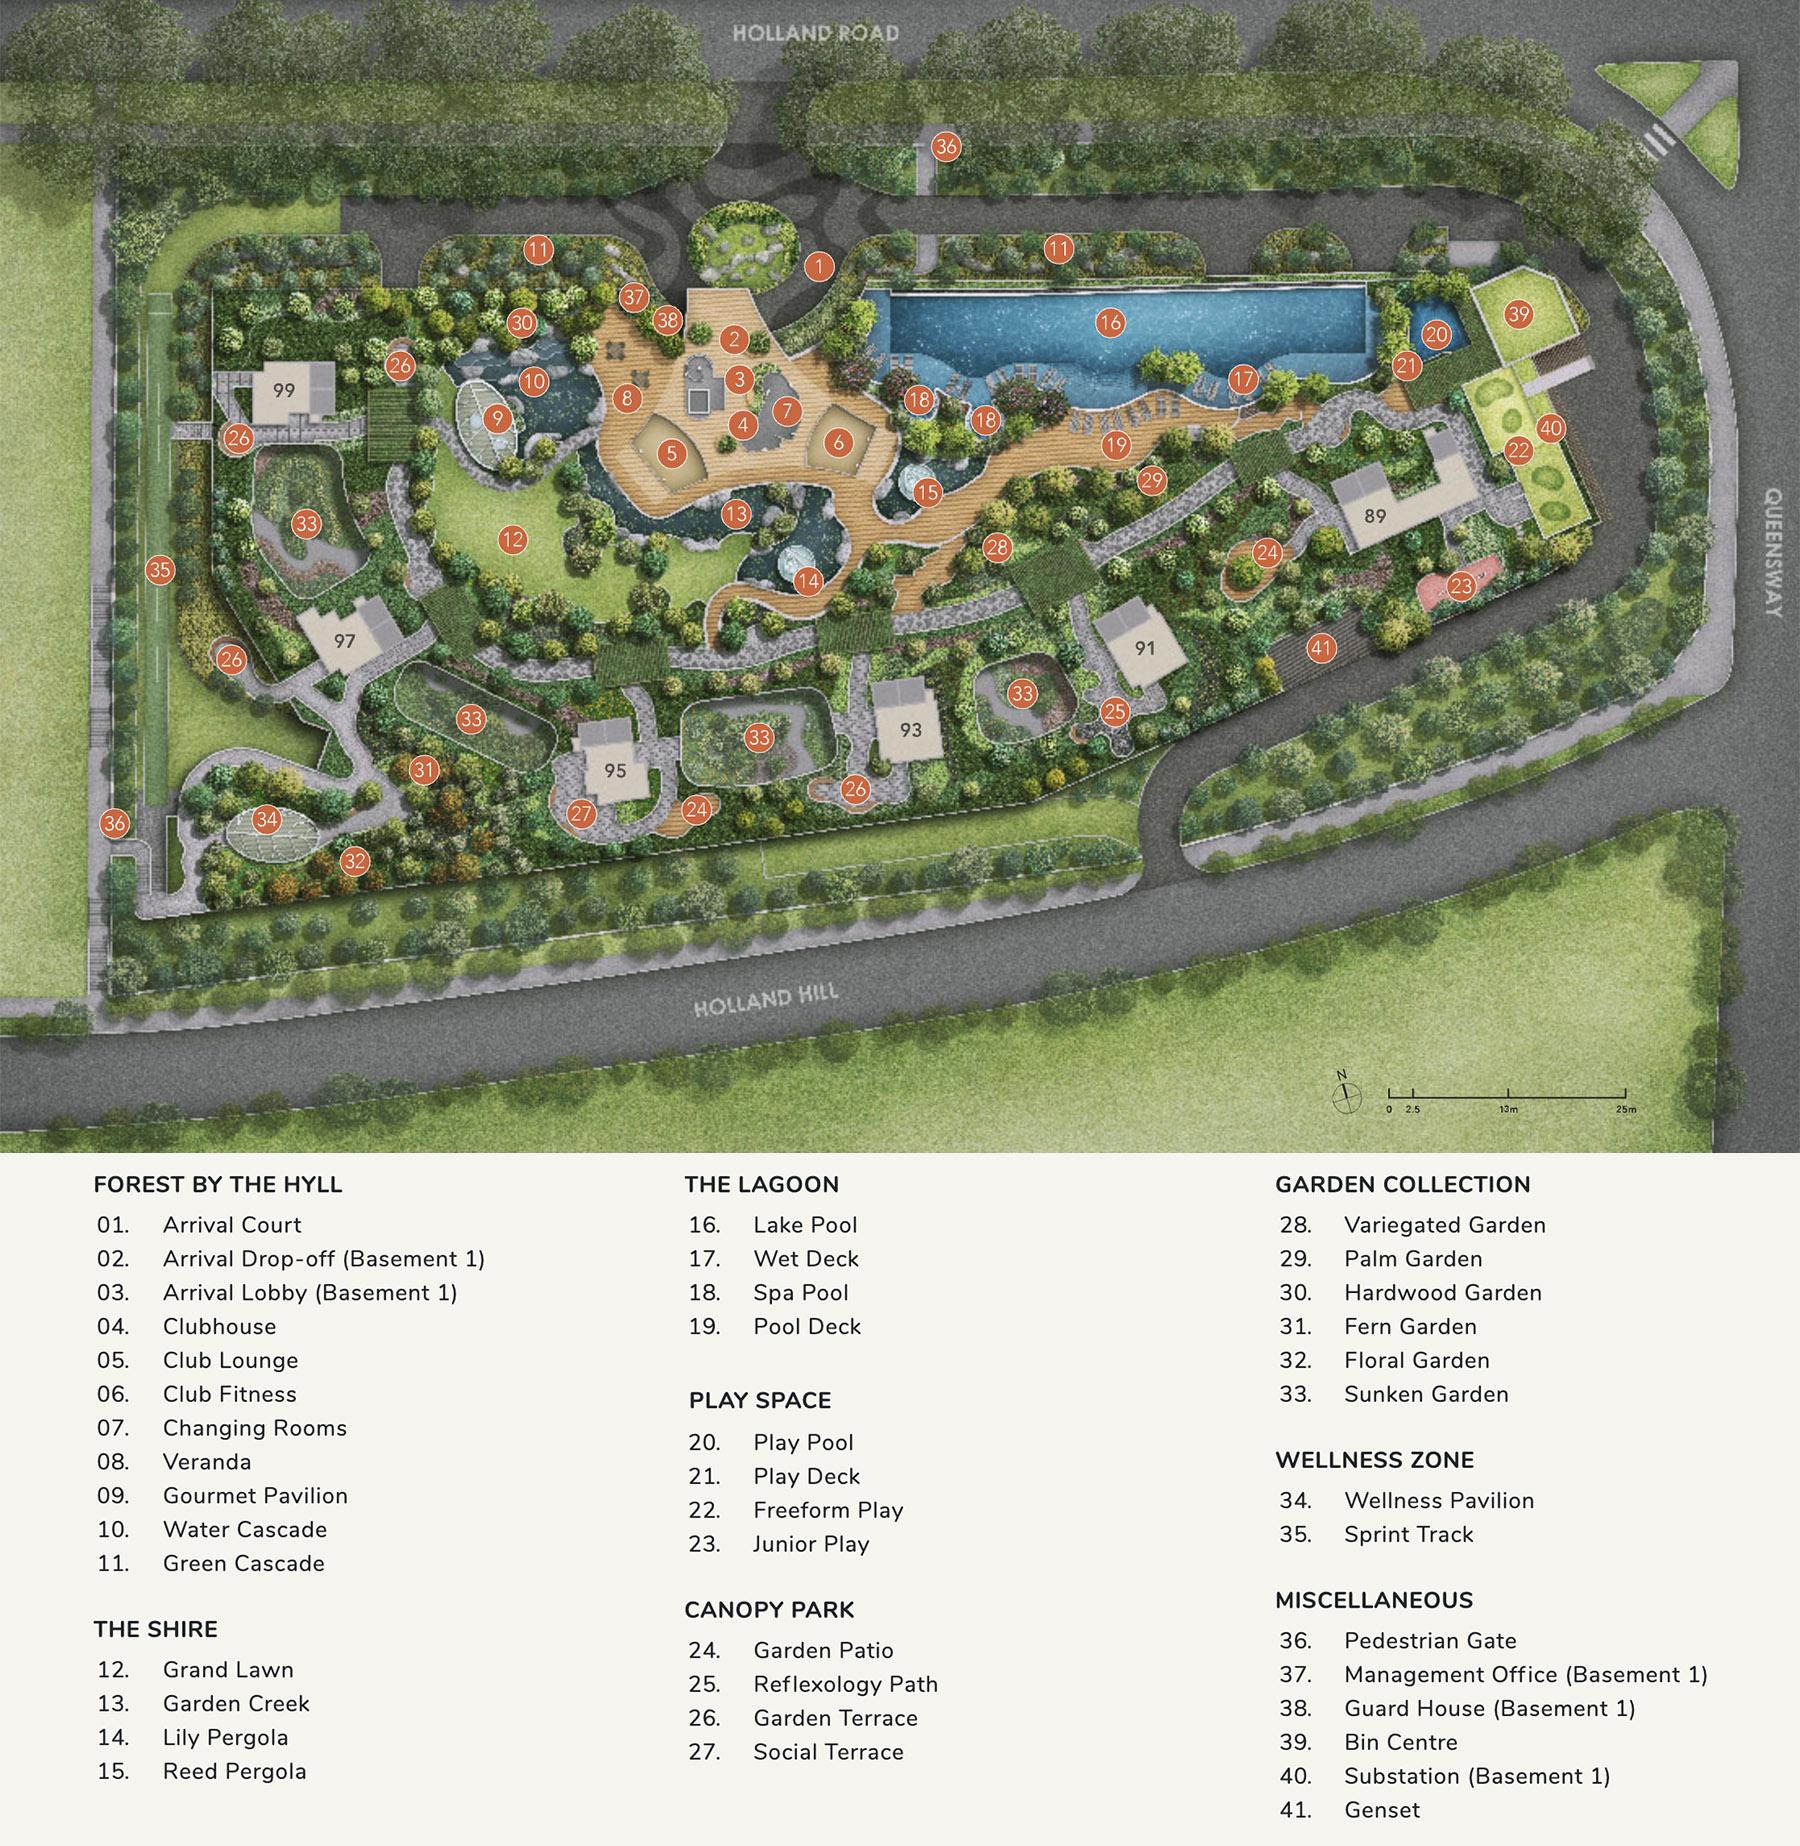 hyll-on-holland-new-condo-site-plan